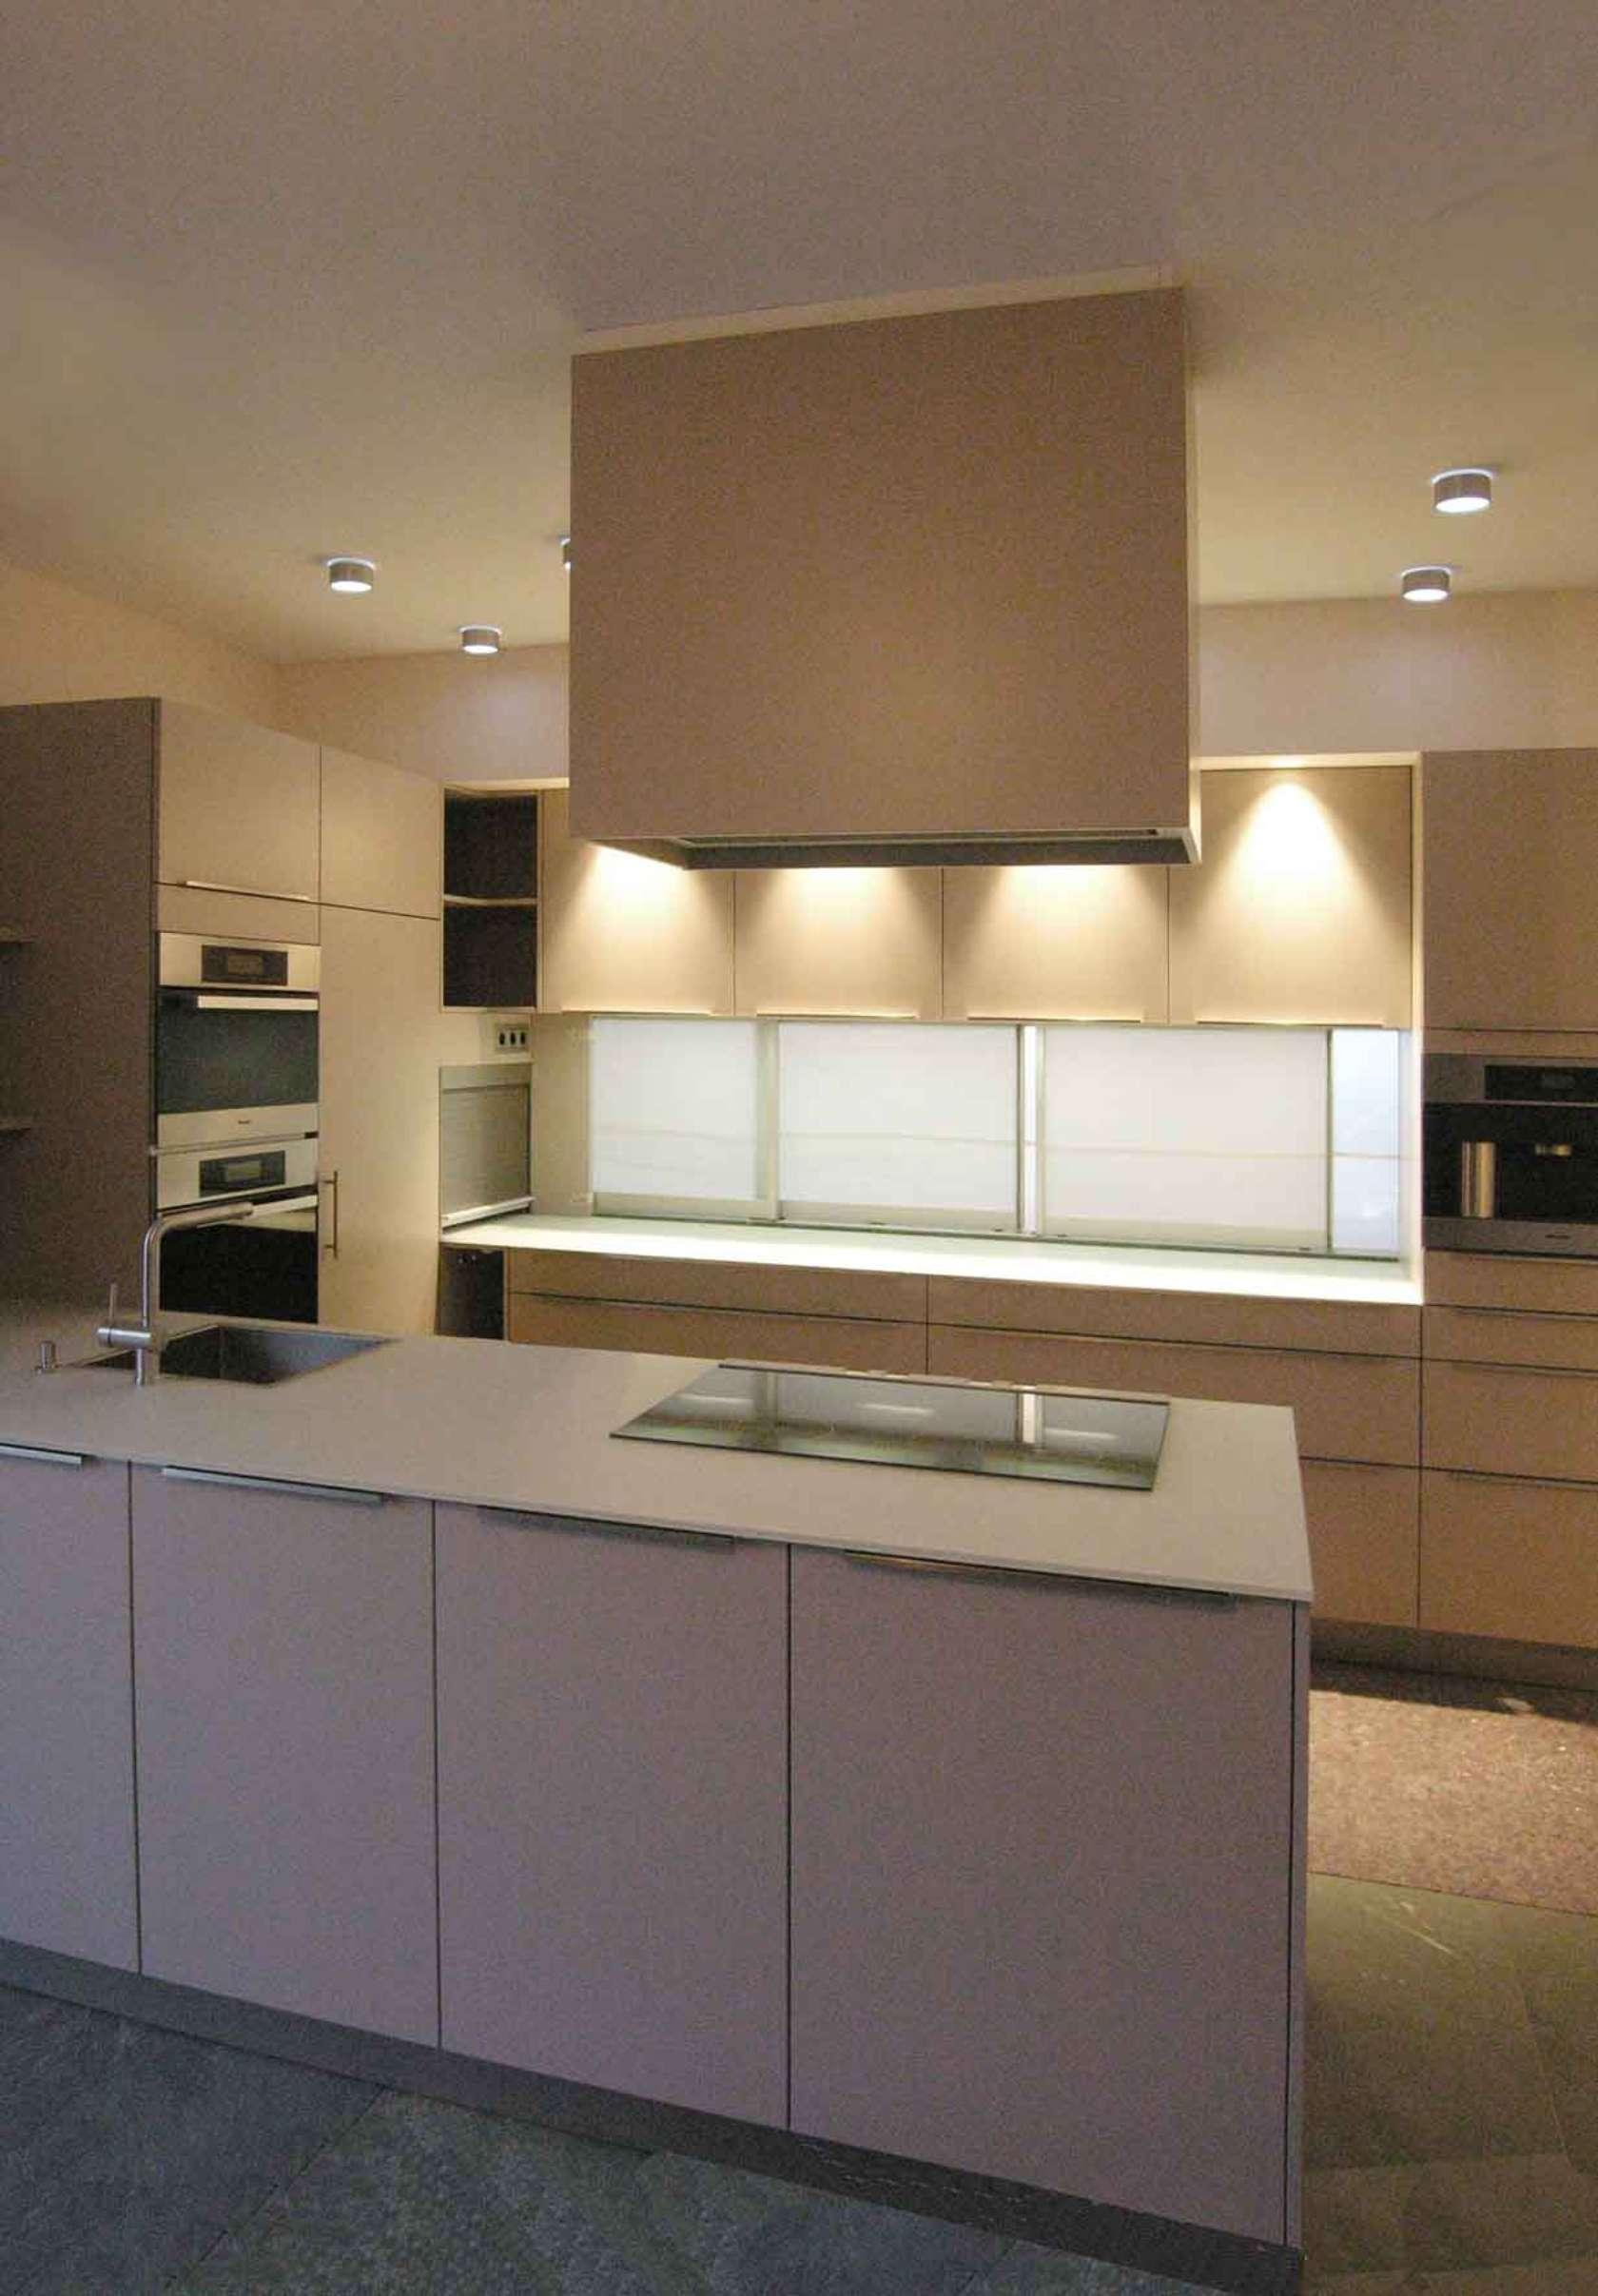 Residential building lighting interior design architizer - Interior lighting design guidelines ...